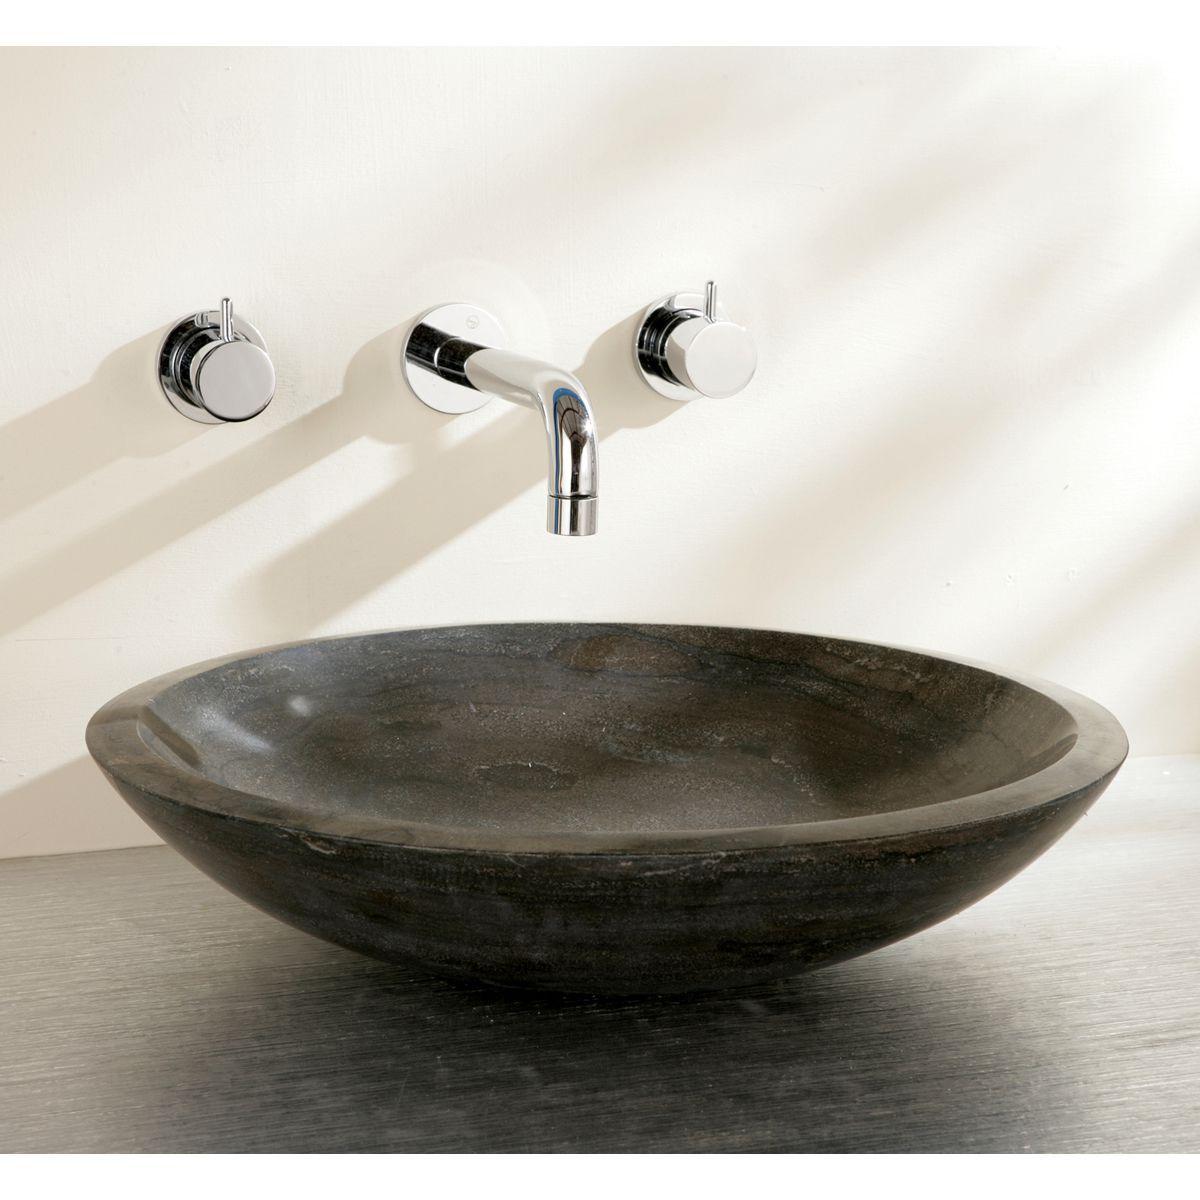 Countertop Basin, Stone Countertops, Bathroom Basin, Stonehenge, Shallow,  Basins, Taps, Faucets, Work Surface